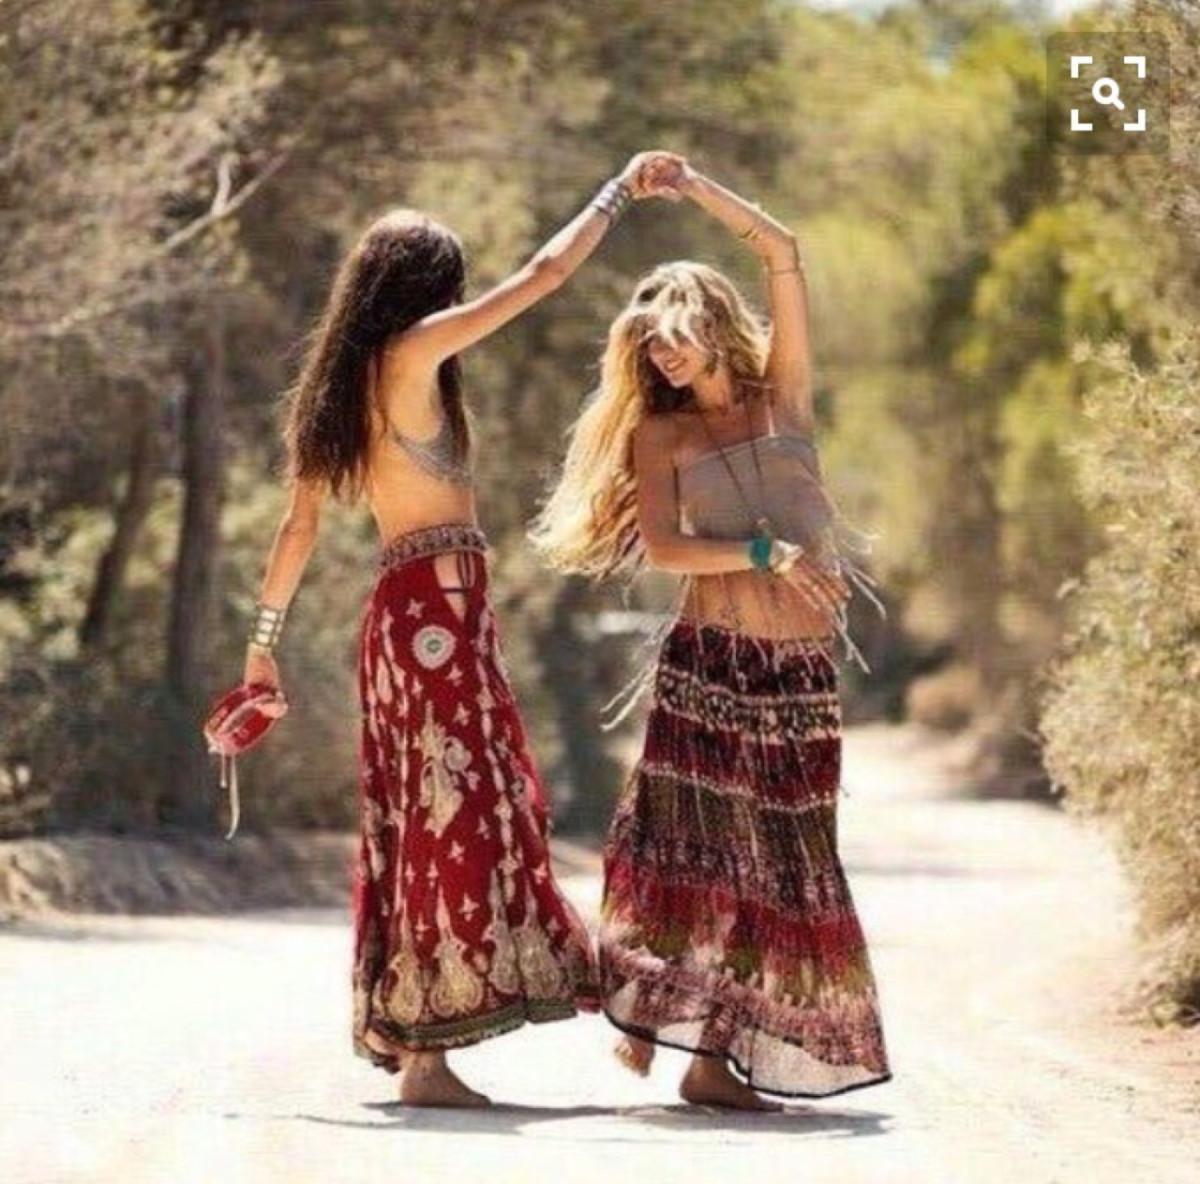 70's hippies dancing in the street